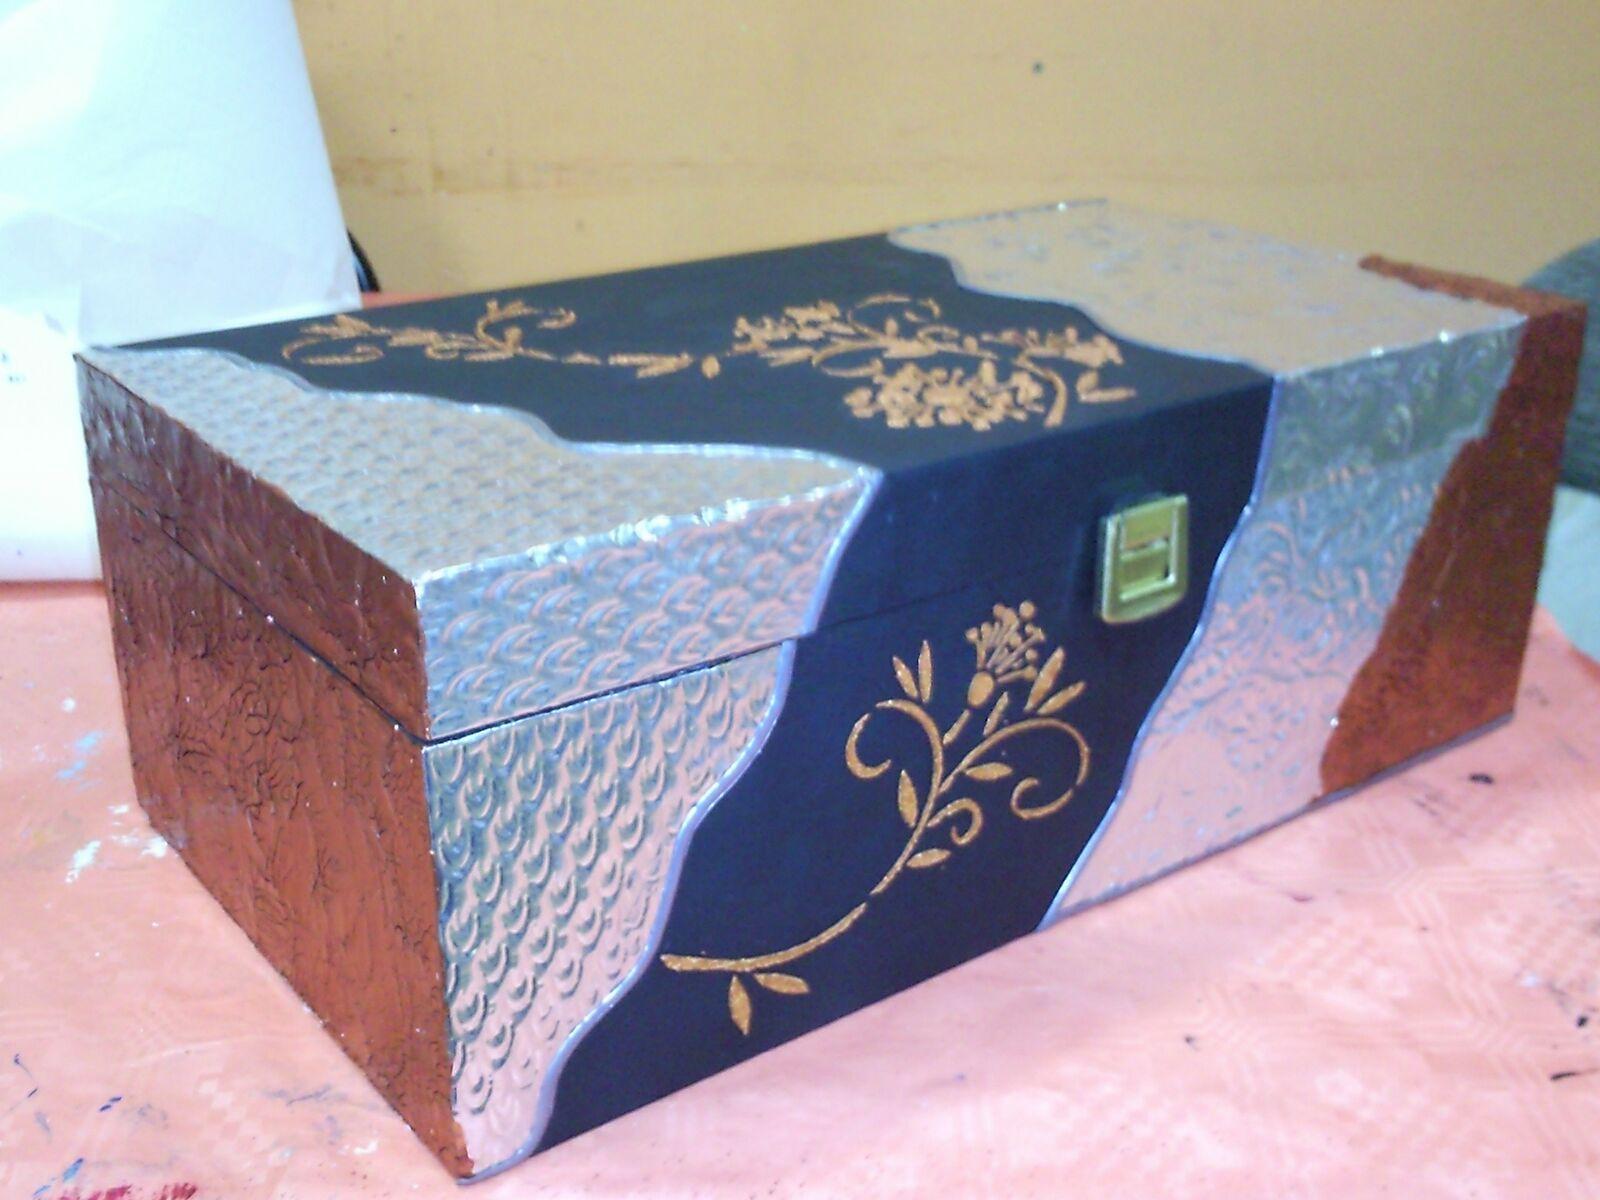 Hazlo t manualidades barcelona tecnicas sobre madera 2 - Cajas madera barcelona ...